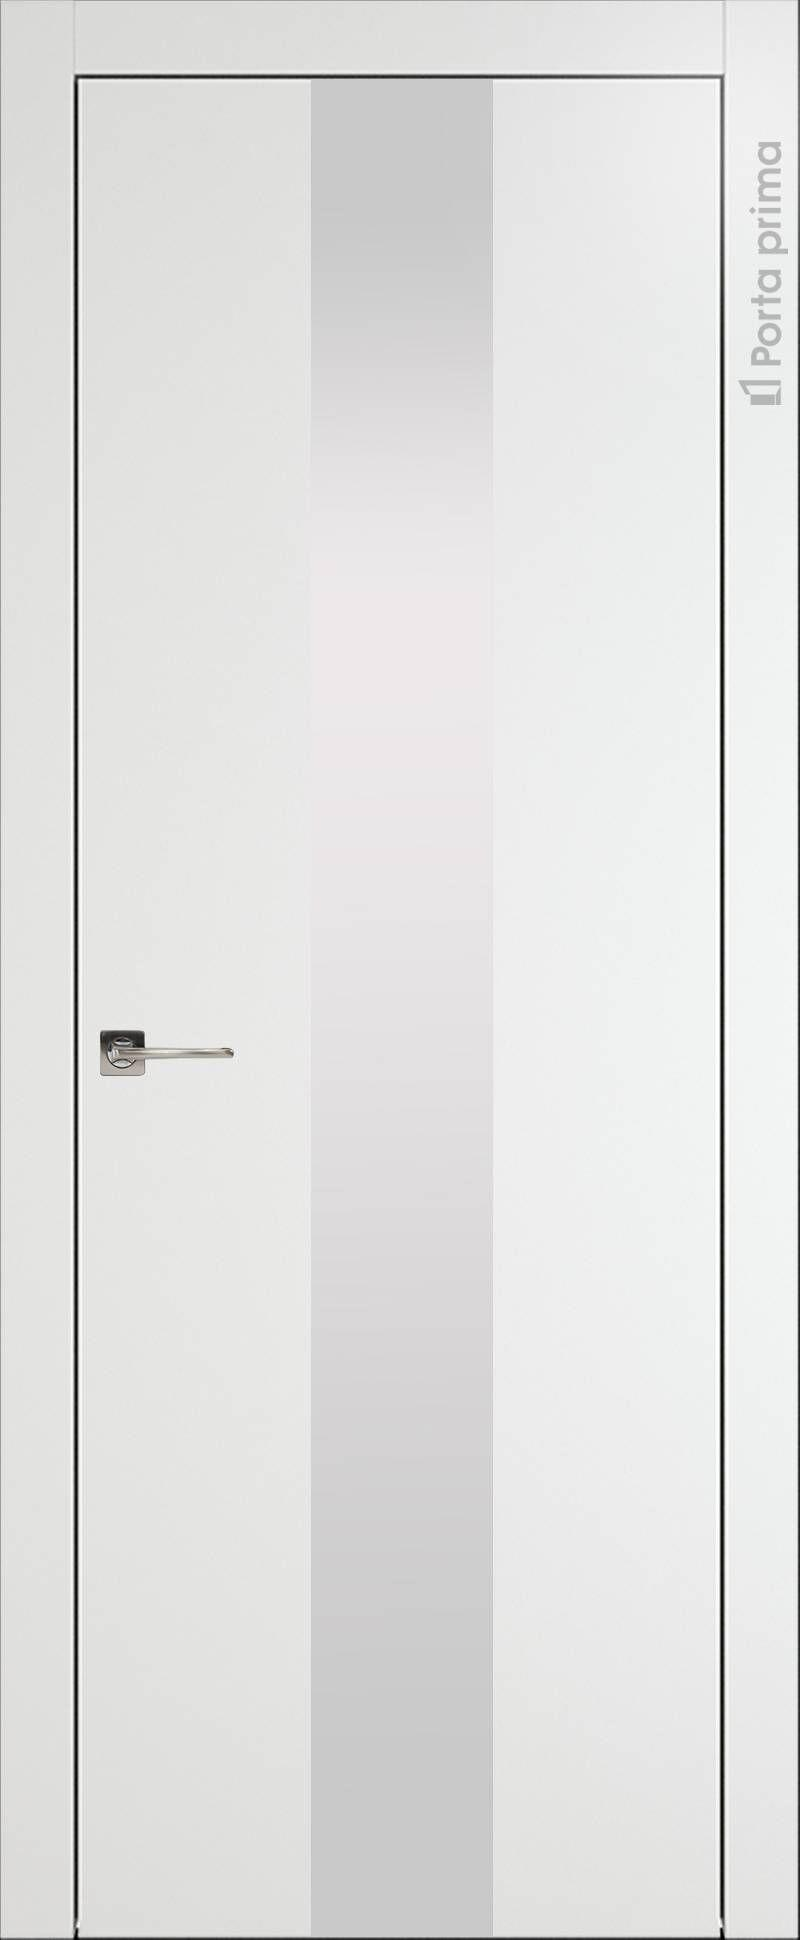 Tivoli Ж-5 цвет - Белая эмаль (RAL 9003) Со стеклом (ДО)